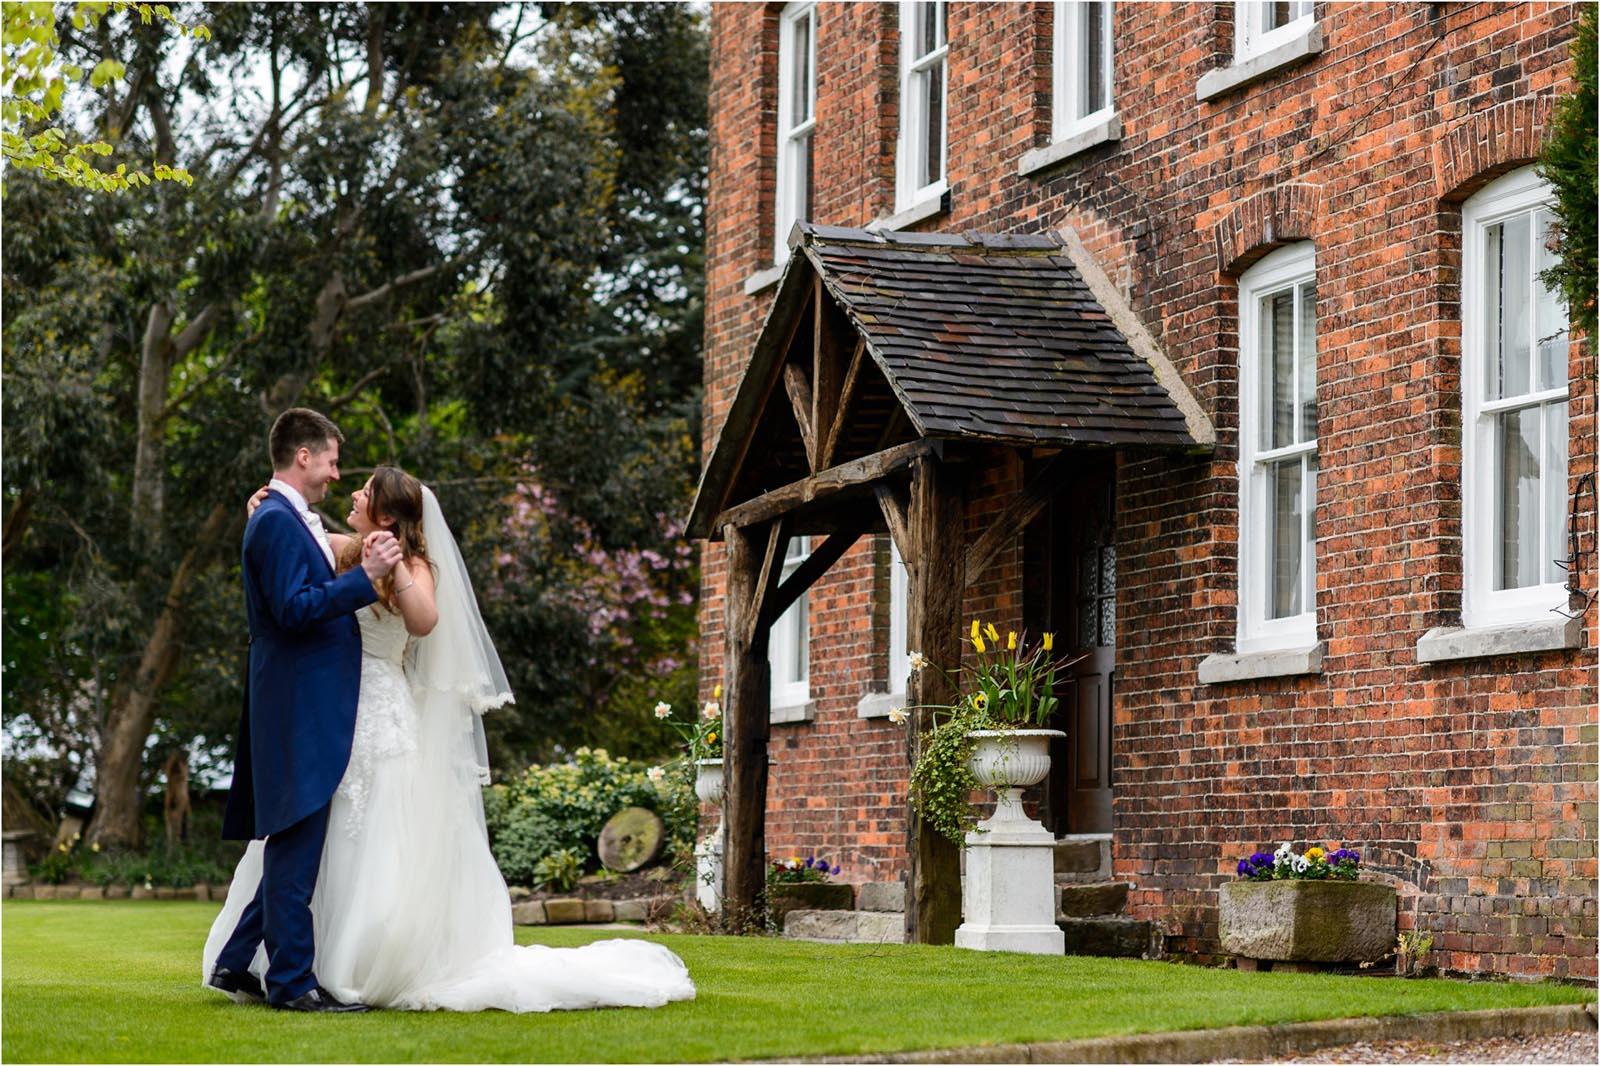 Domvilles Farm wedding photographer